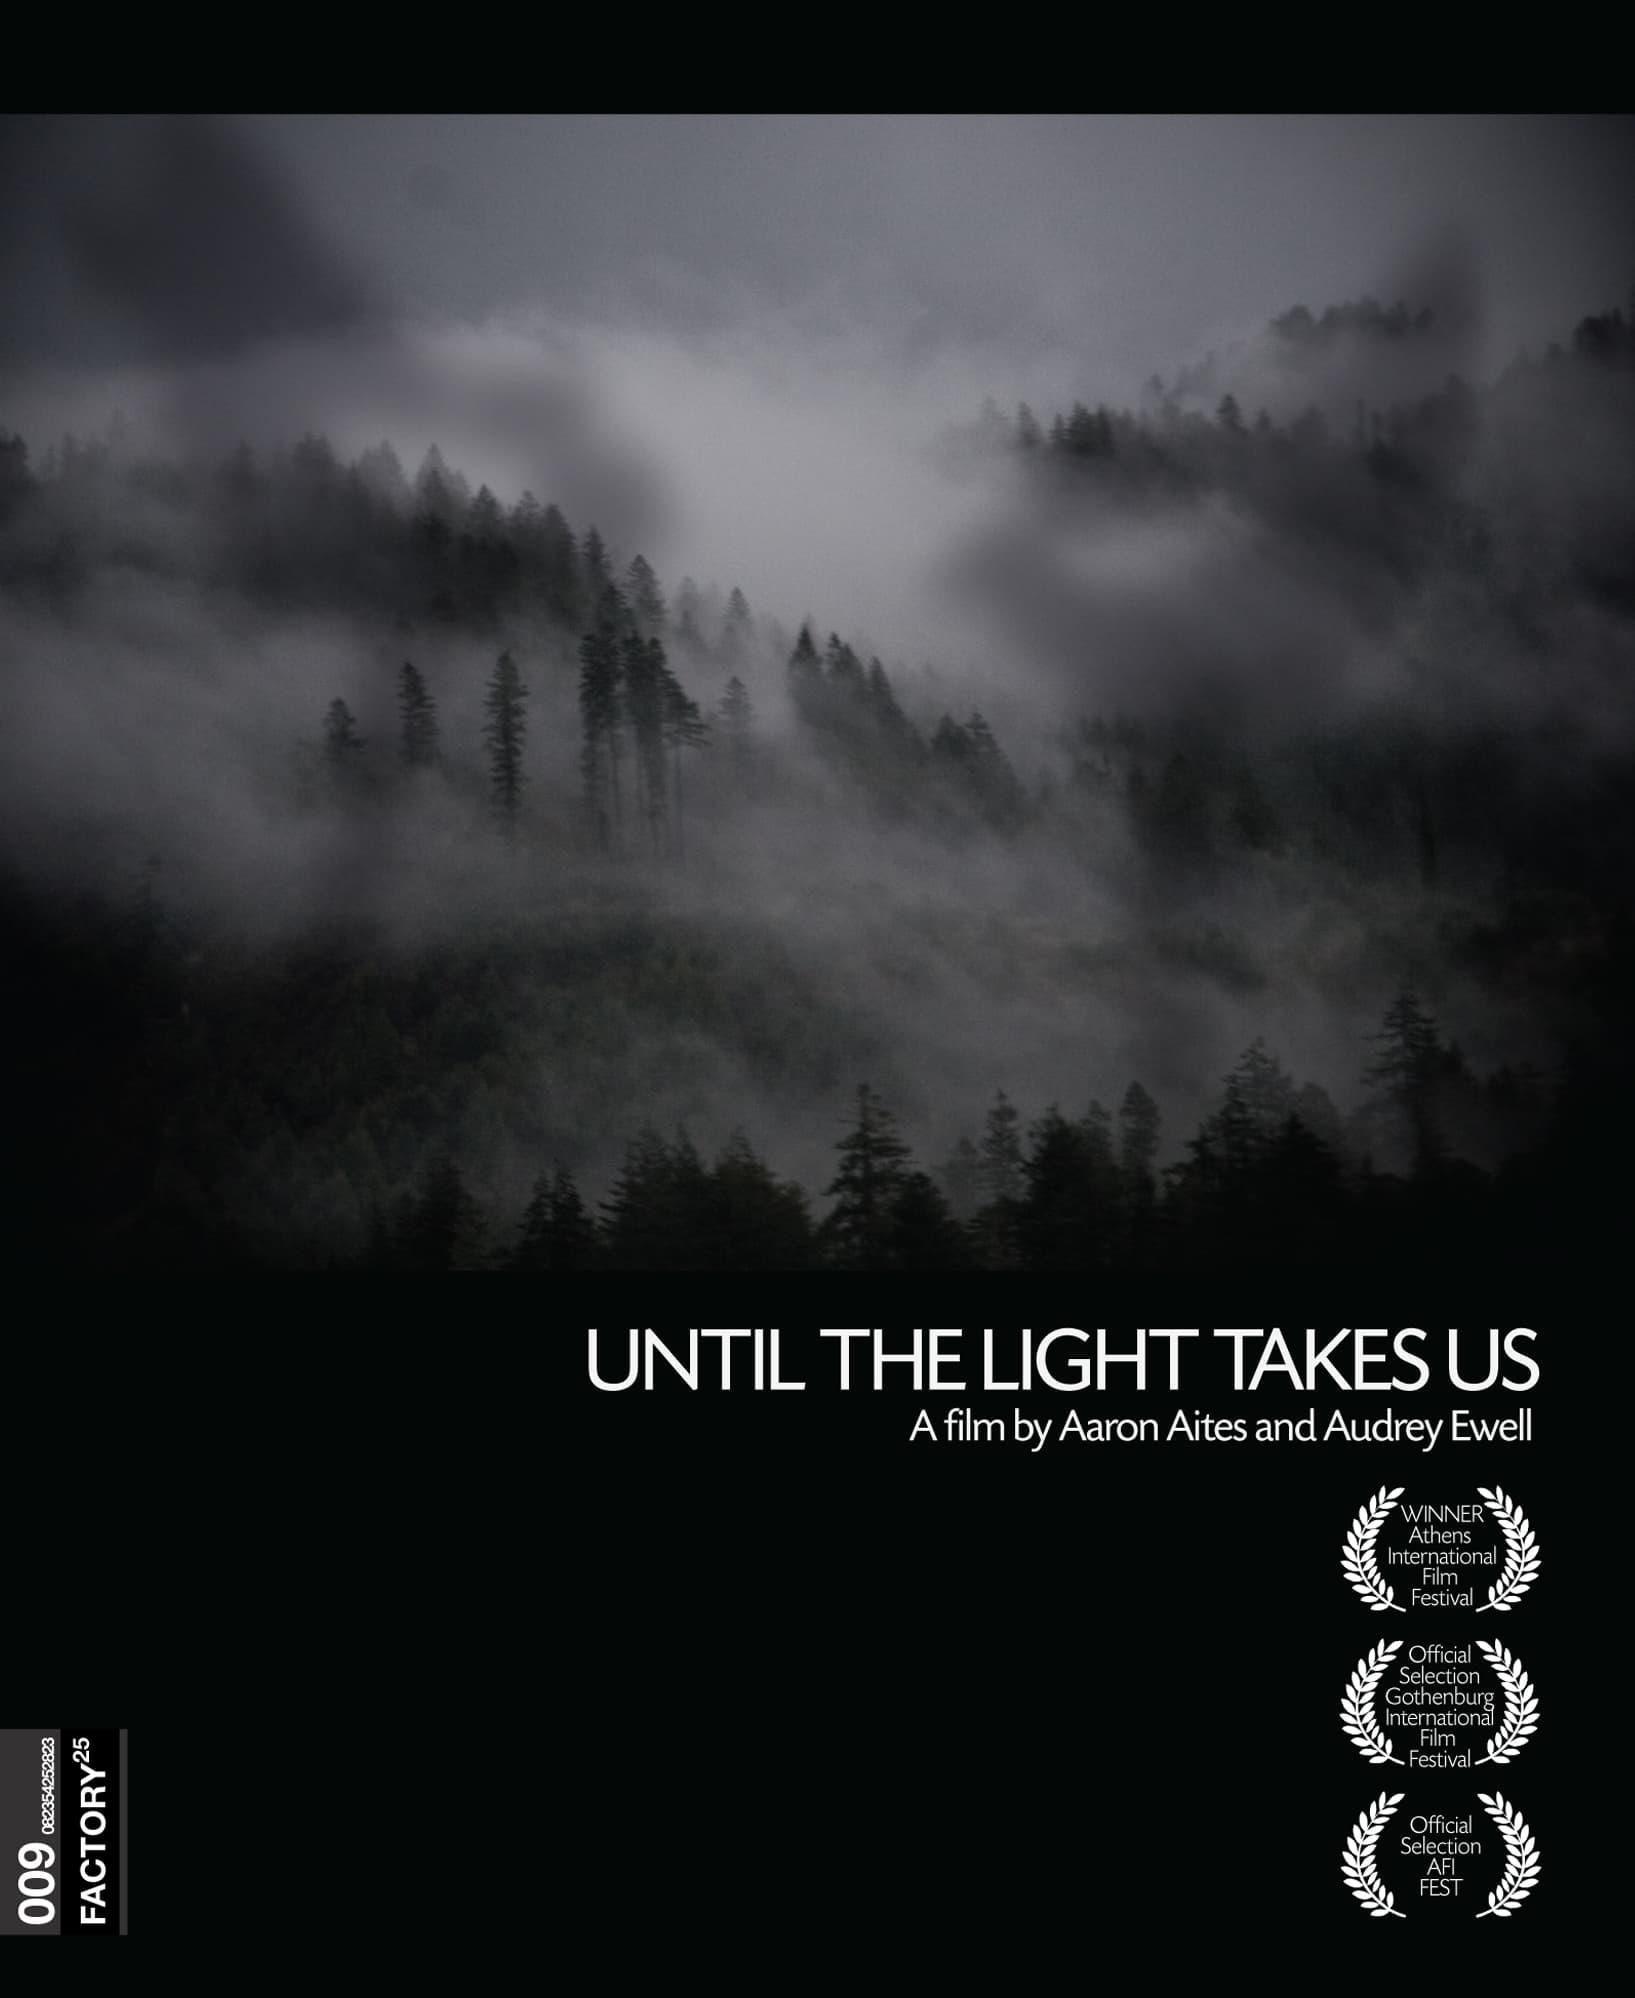 Until the light takes us сюжет восприятие критиками